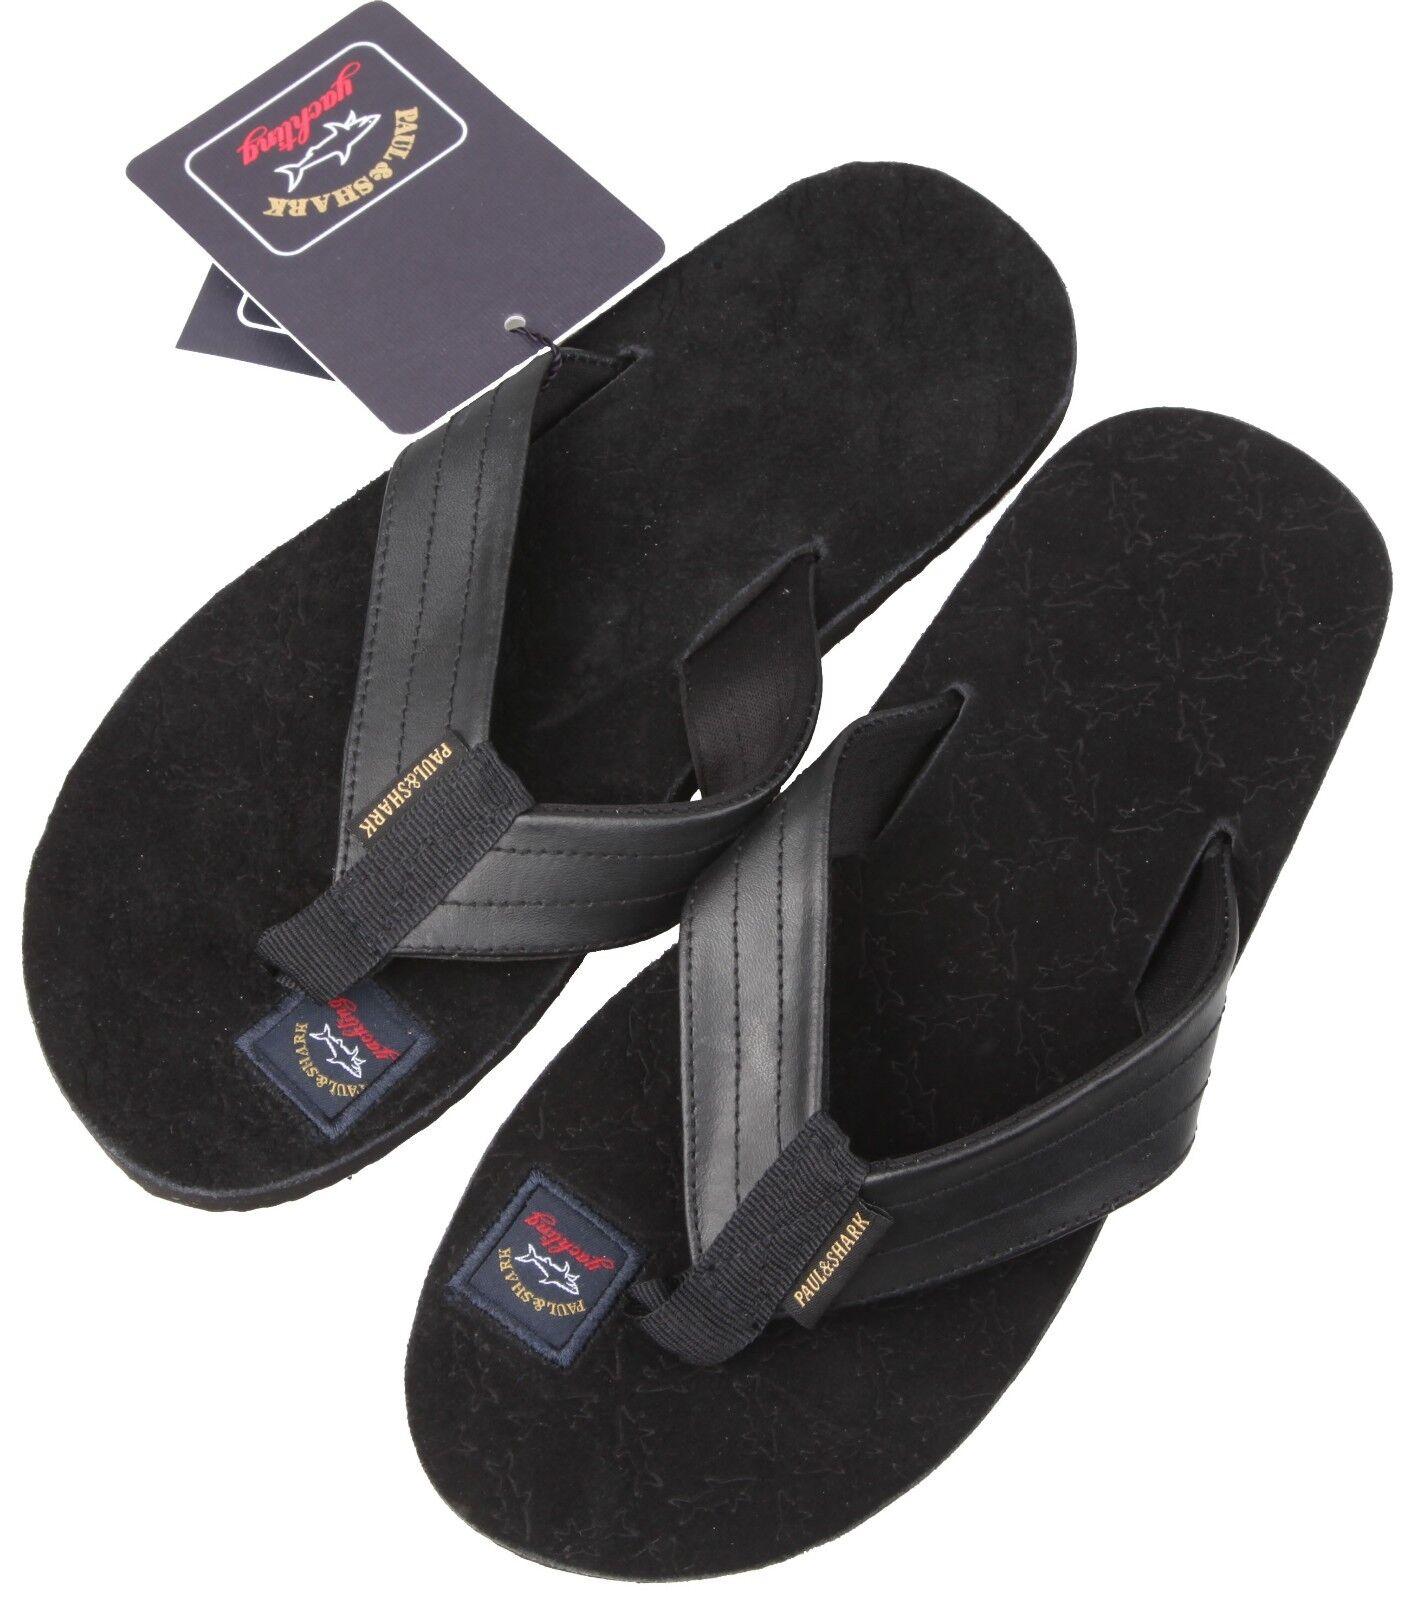 PAUL  SHARK YACHTING Leder Leder Leder Sandalen Schuhe Leder Schuhes Sandales 44 UK 10 US 11 a130b9